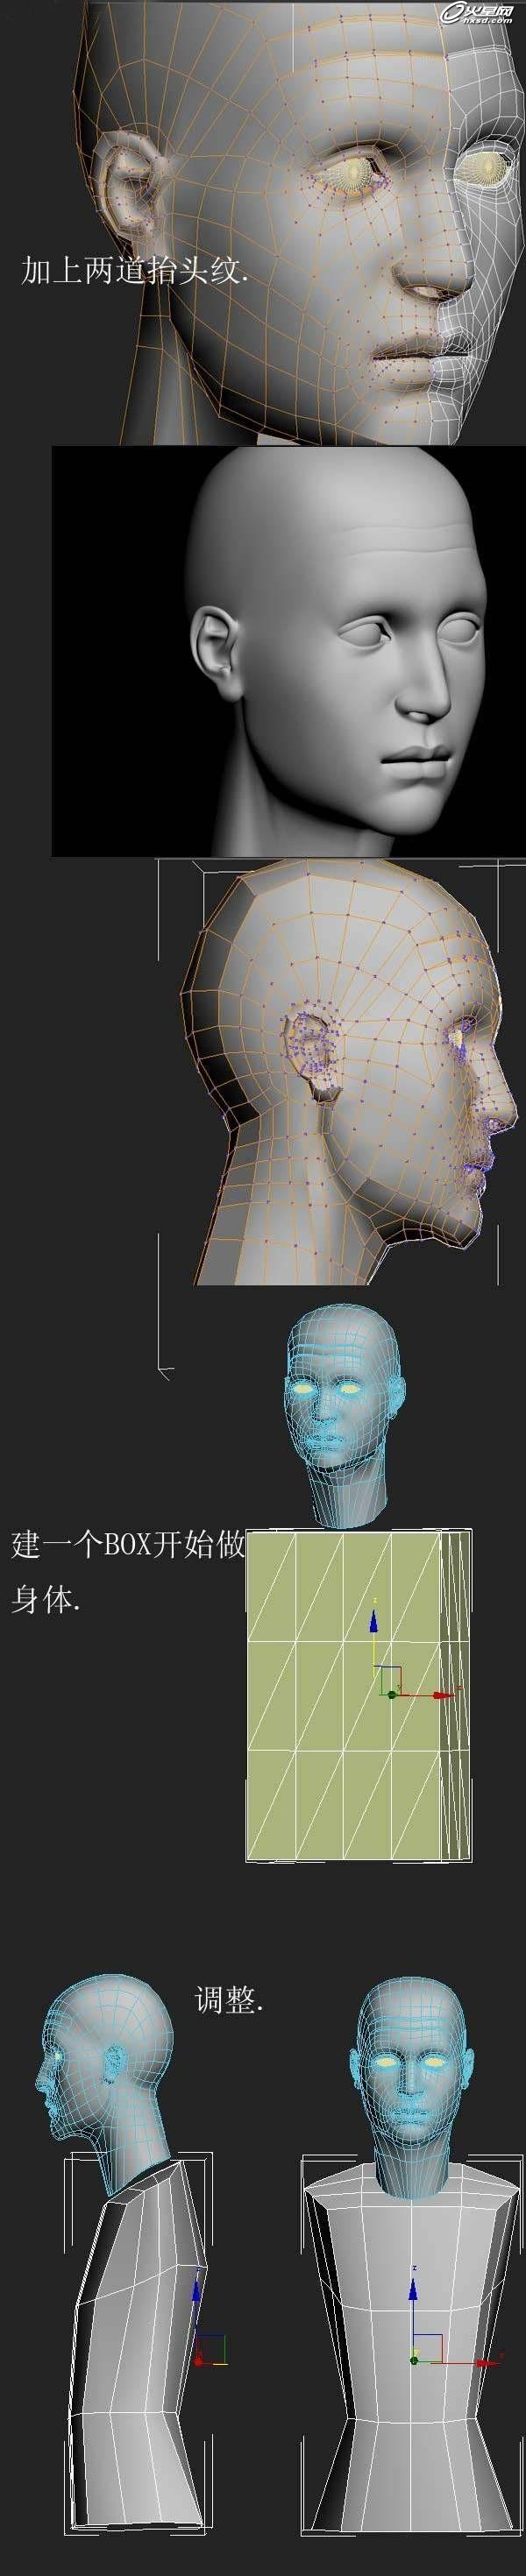 3D角色要想制作的更具说服力,人物面部和身体的结构至关重要,只有基础打得好才能把后期的细节刻画的更深入,下面是3ds Max制作的美女角色建模的一些方法,供大家学习参考。